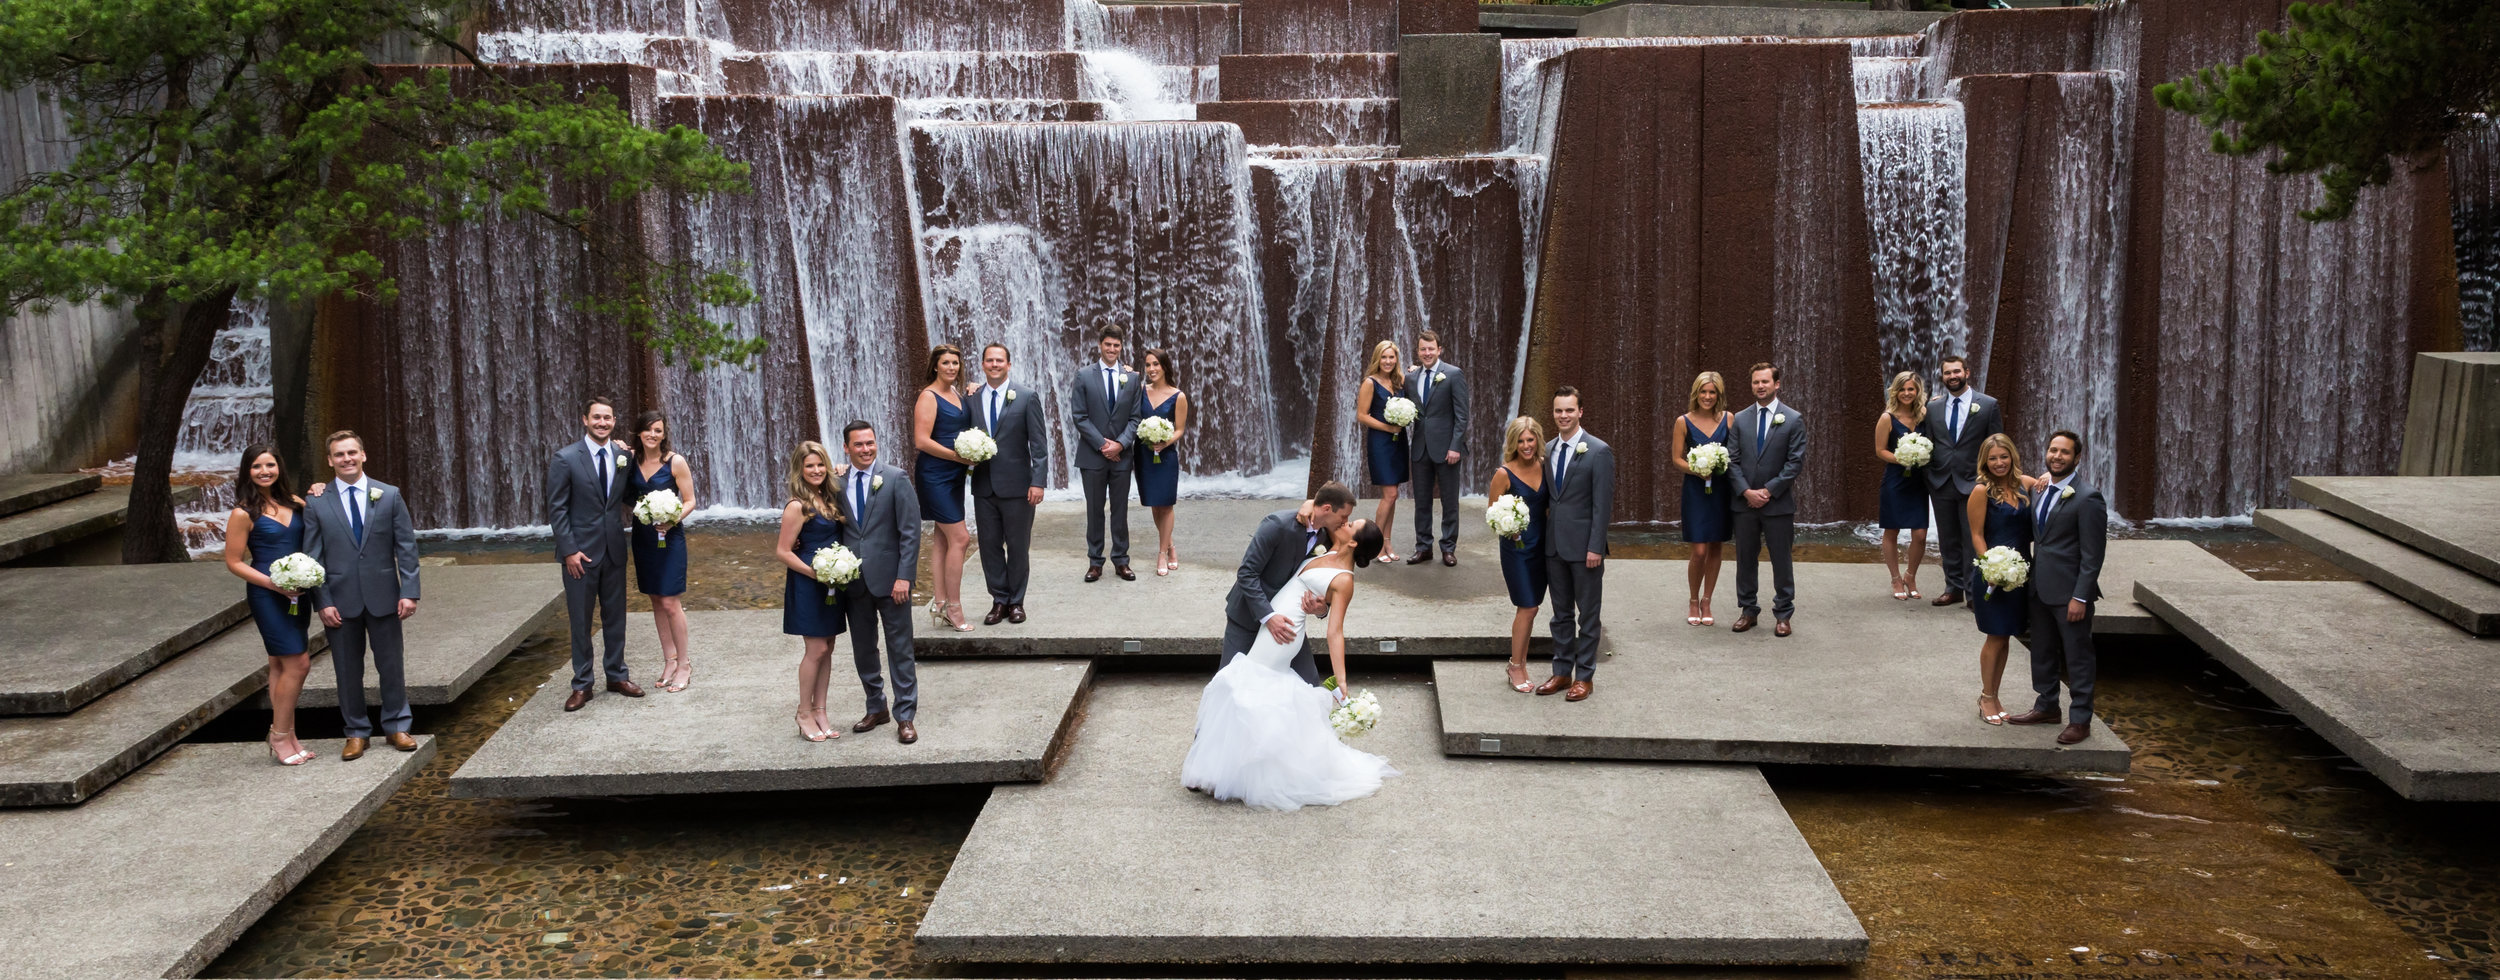 Bridalbliss.com | Portland Wedding Planner | Oregon Event Design | Nicole Goddard PhotographyBridalbliss.com | Portland Wedding Planner | Oregon Event Design | Nicole Goddard Photography